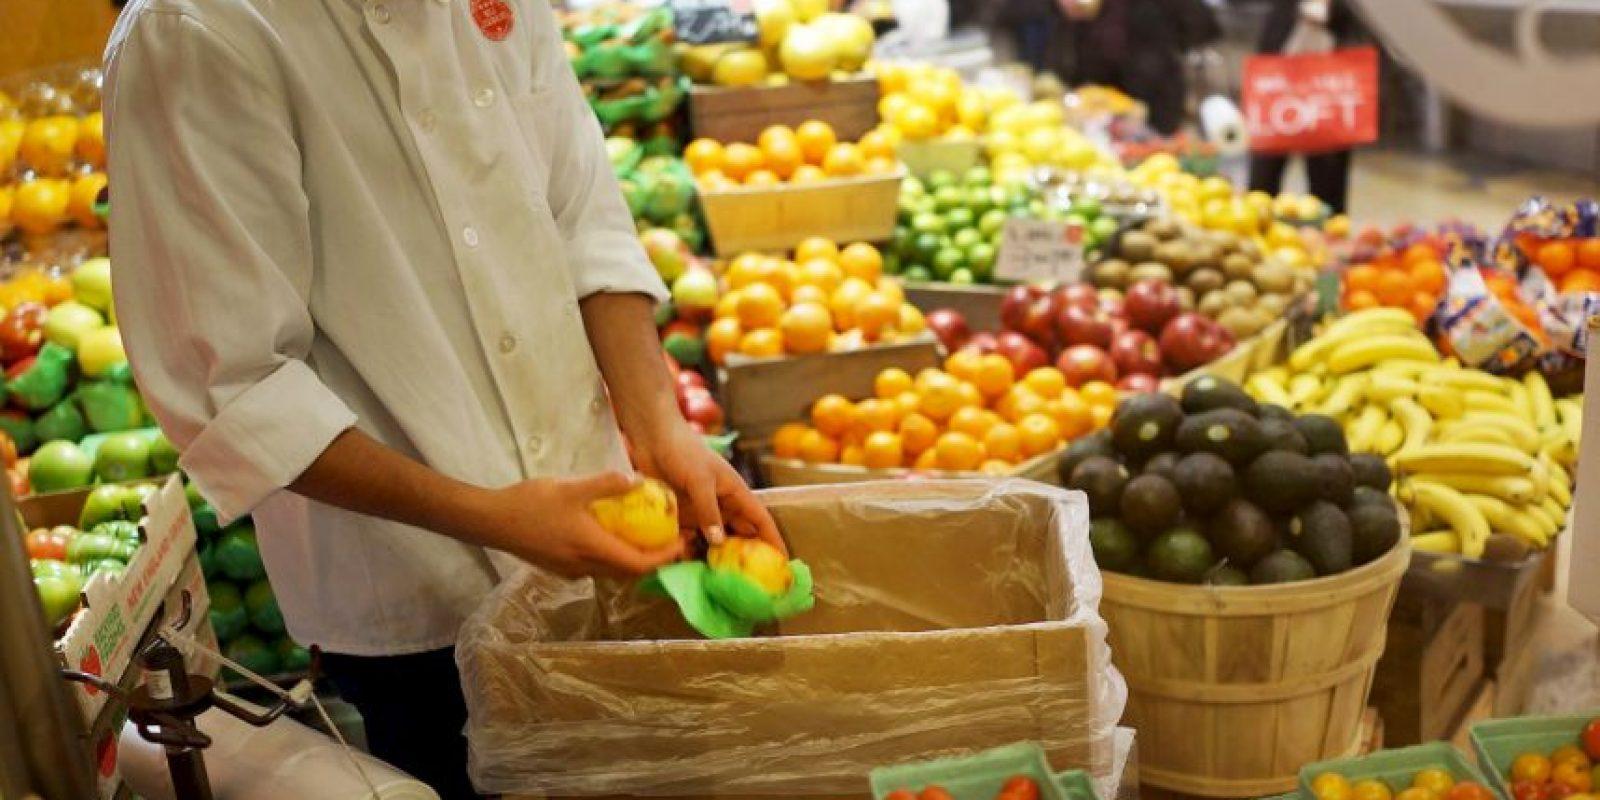 Grupos alimenticios Foto:Getty Images